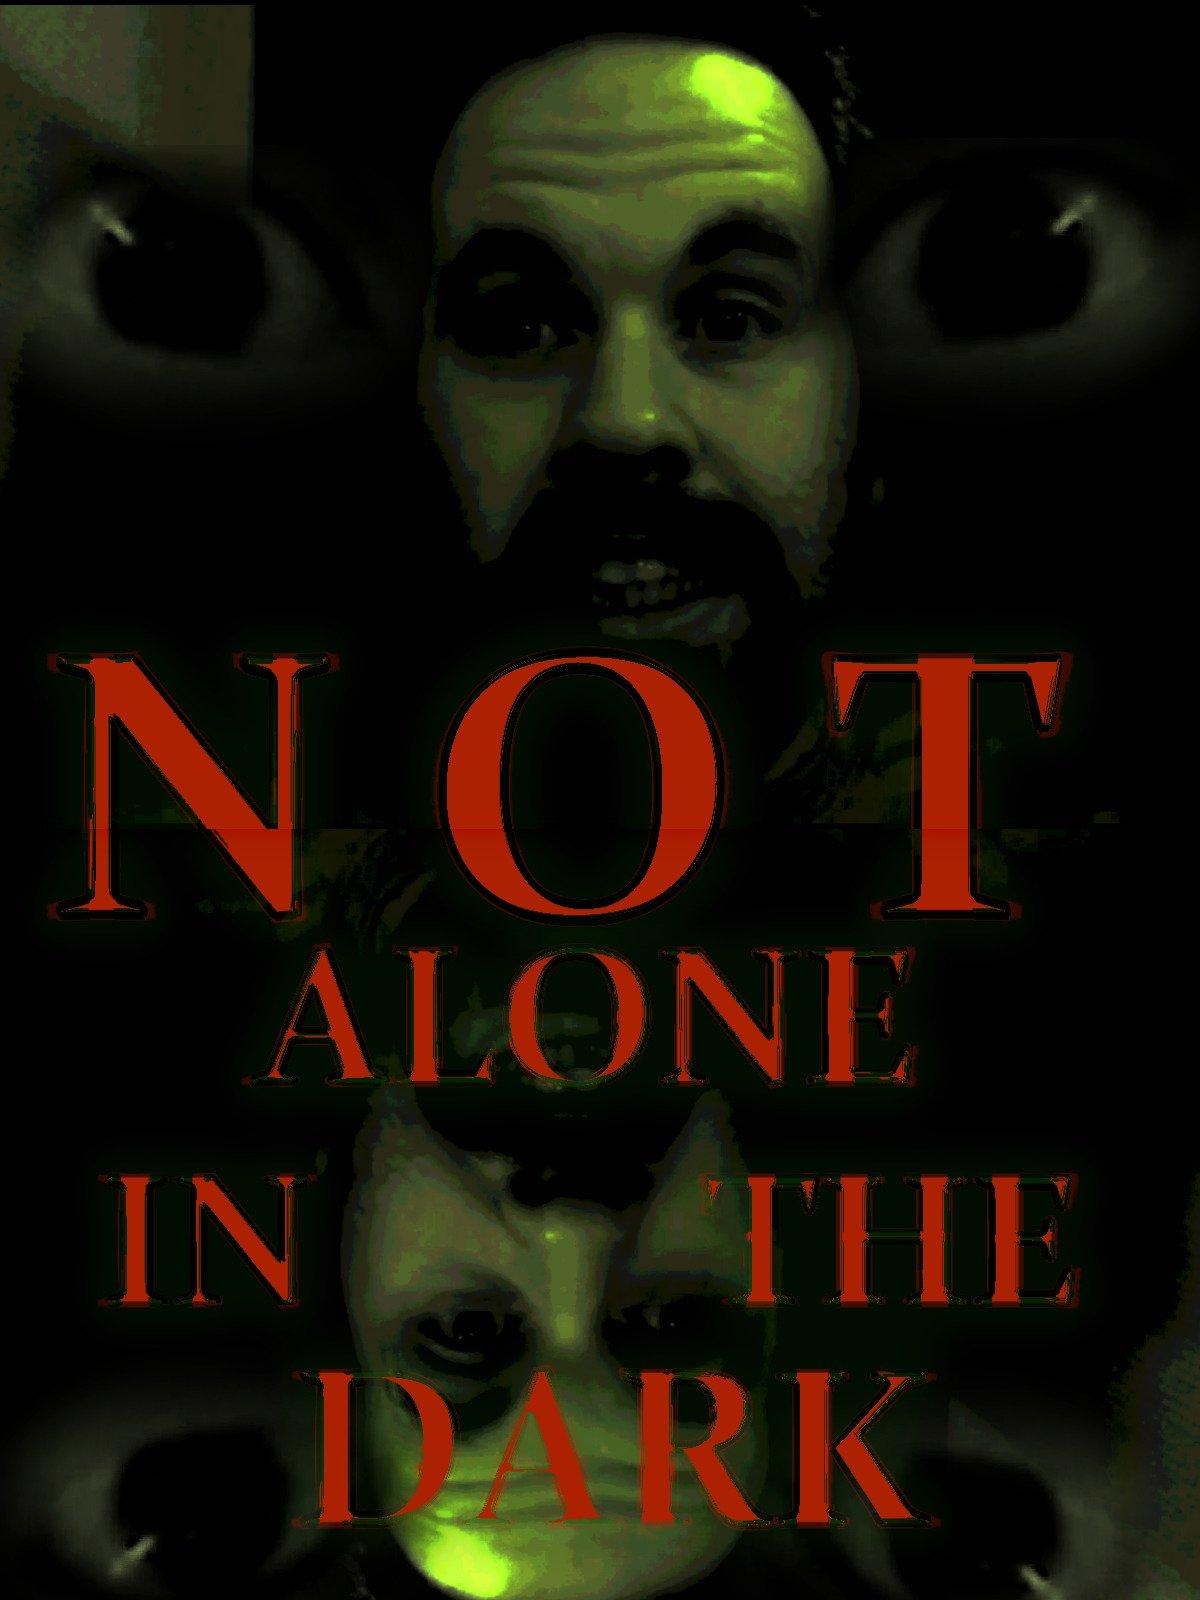 Not alone in the dark